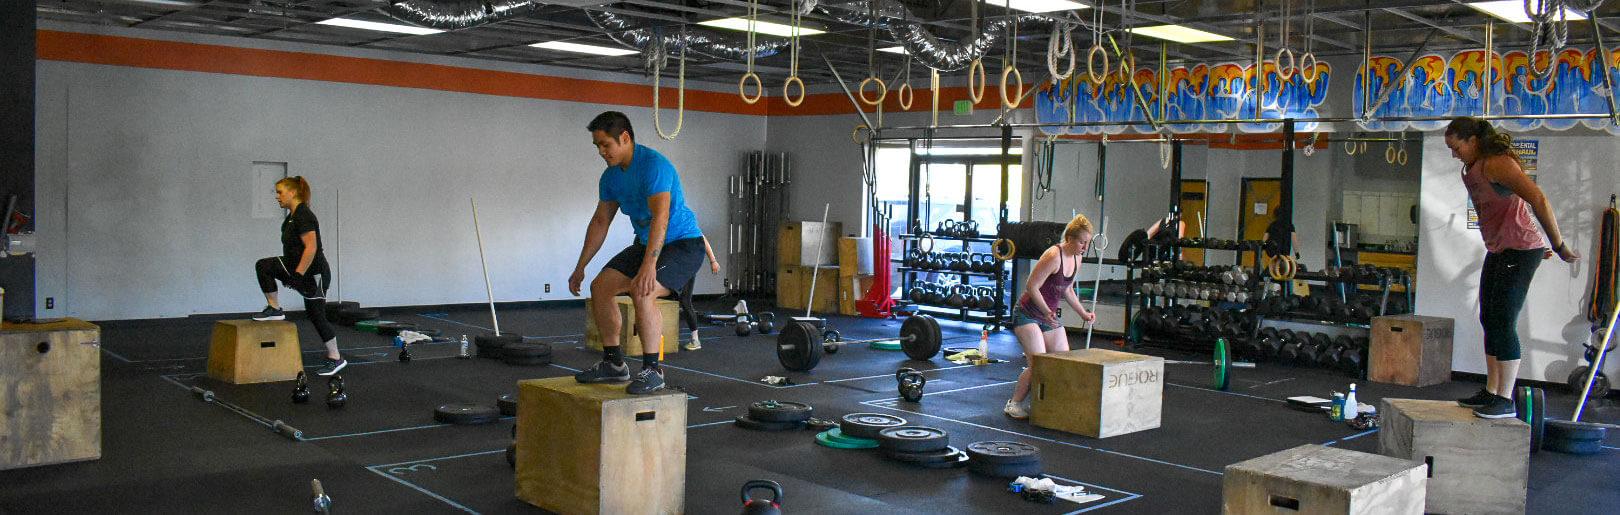 Class performs box jumps at CrossFit Alaska.